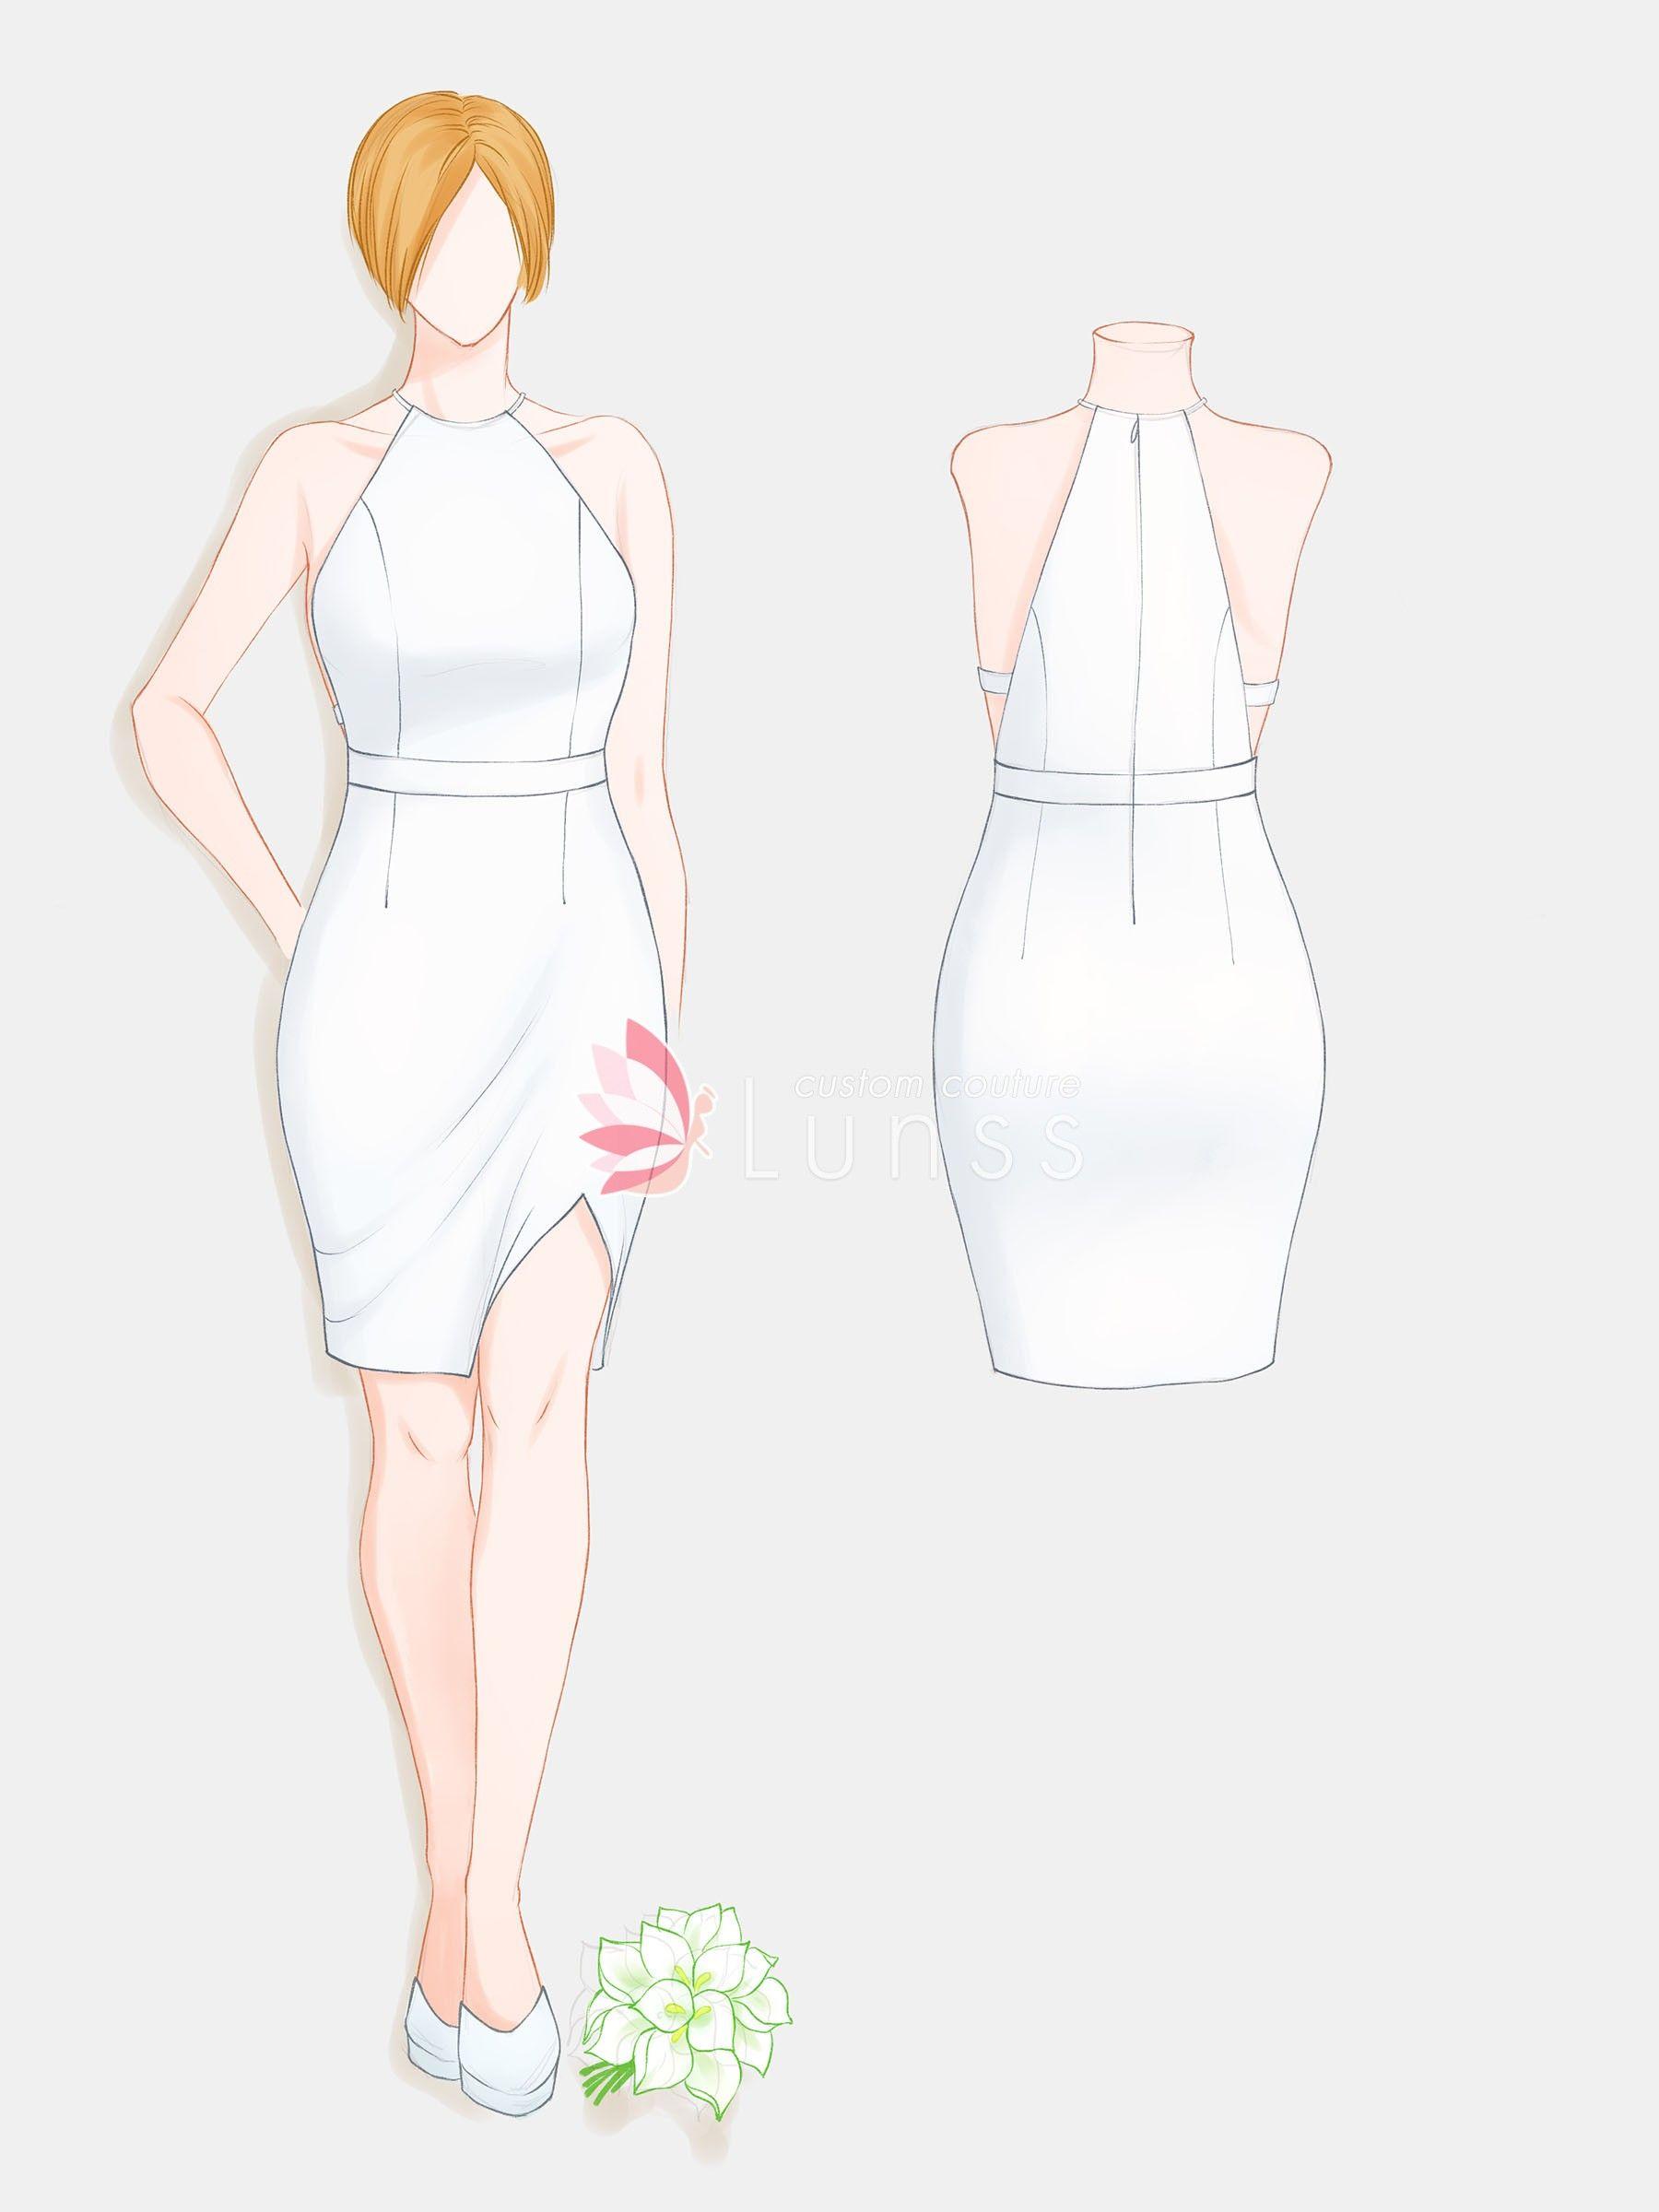 Short Dress Drawing : short, dress, drawing, Halter, Sleeveless, Short, Dress, Sketch, Sketches,, Fashion, Drawing, Dresses,, Sketches, Dresses